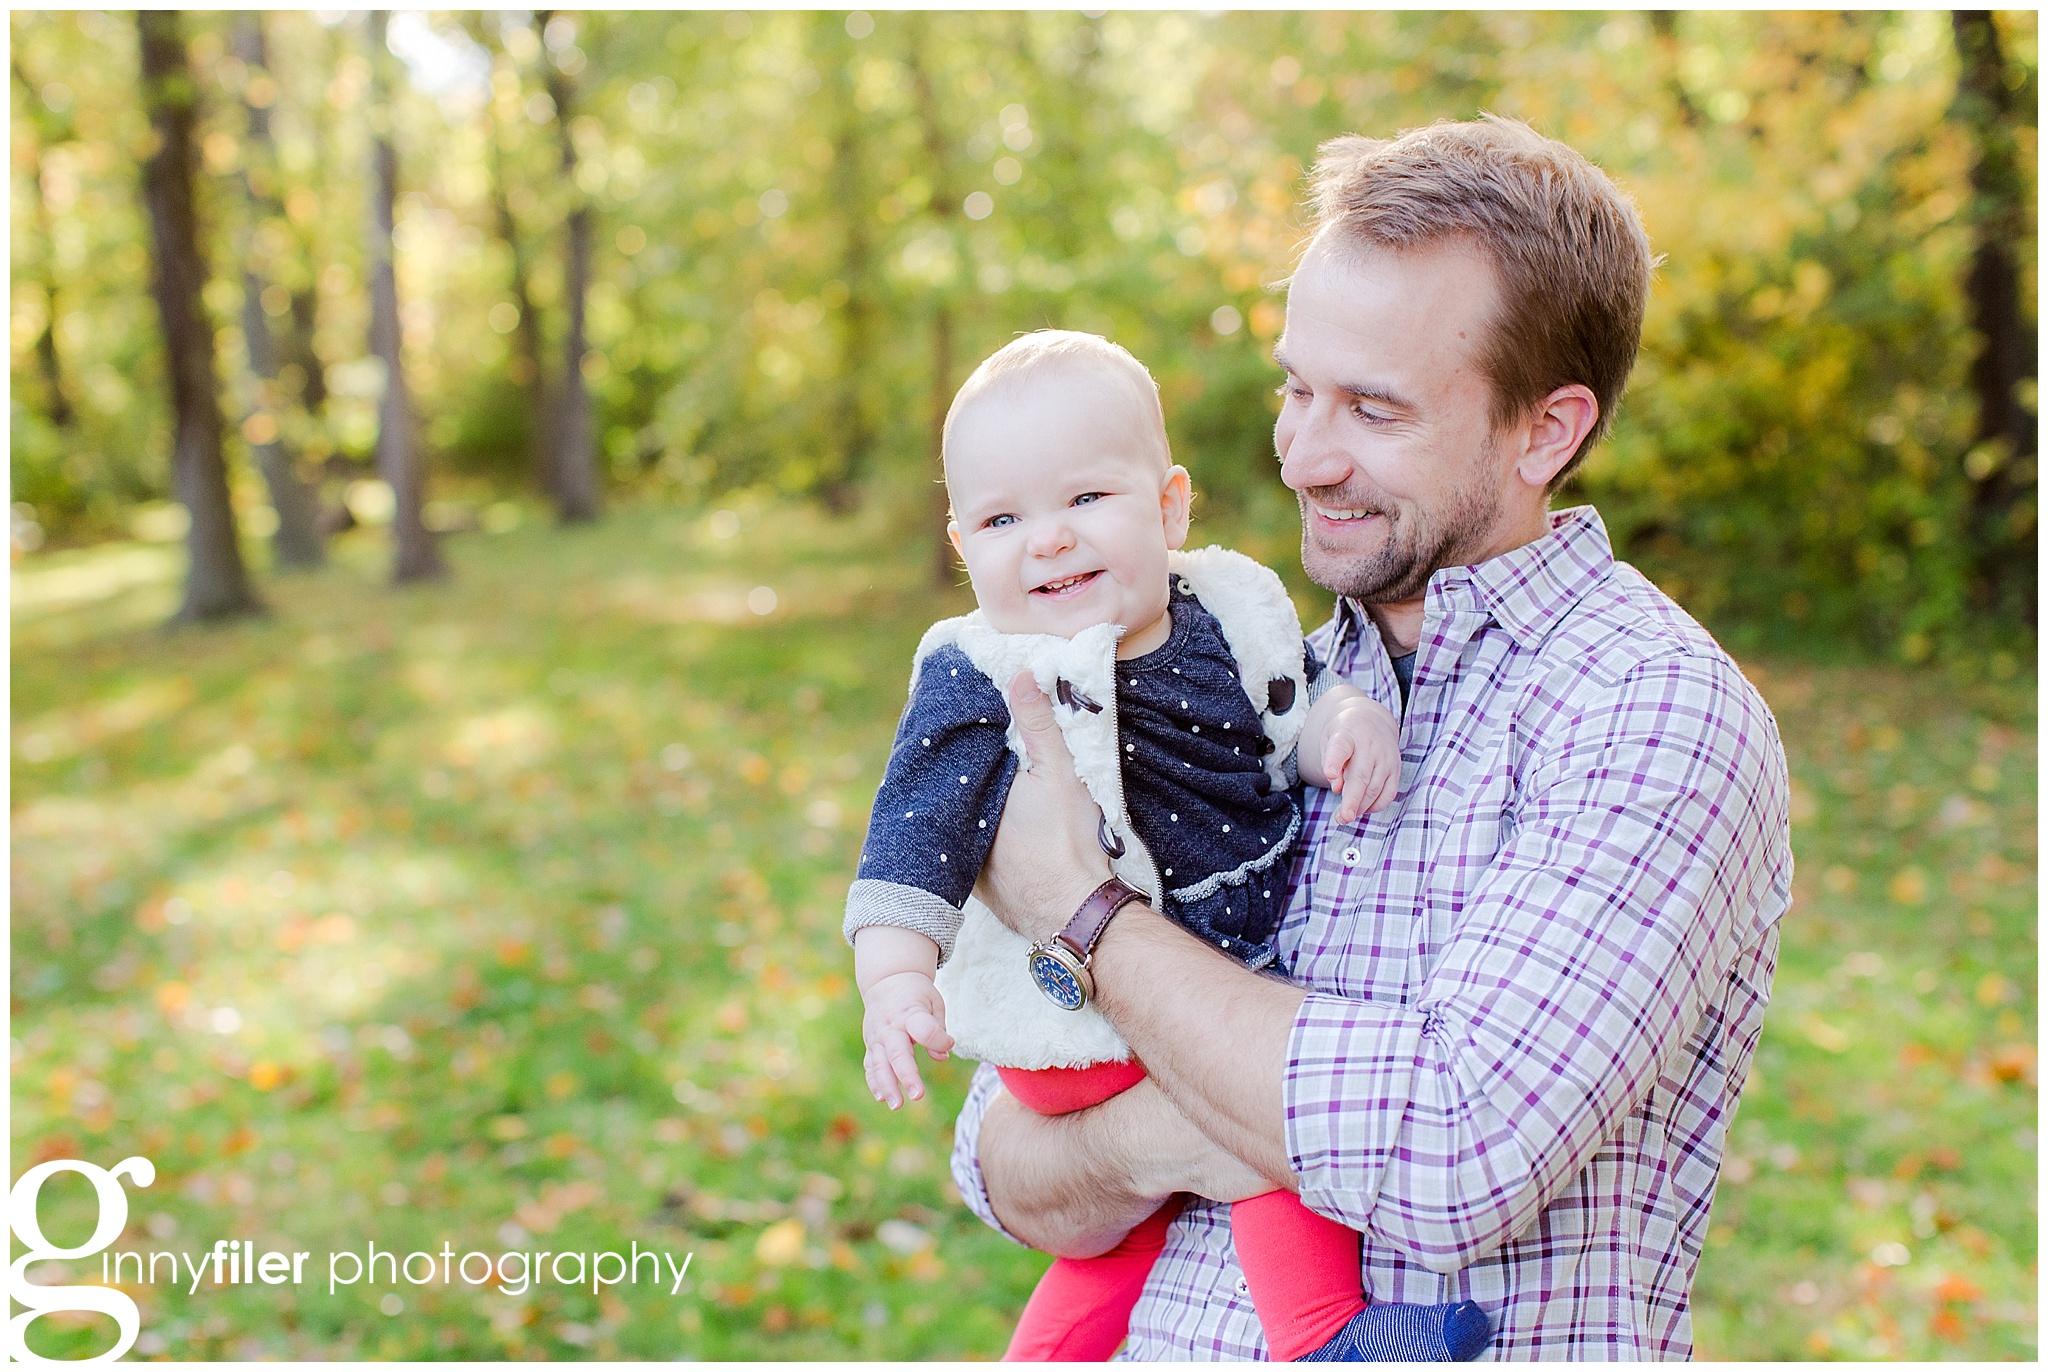 family_photography_klesh_0004.jpg